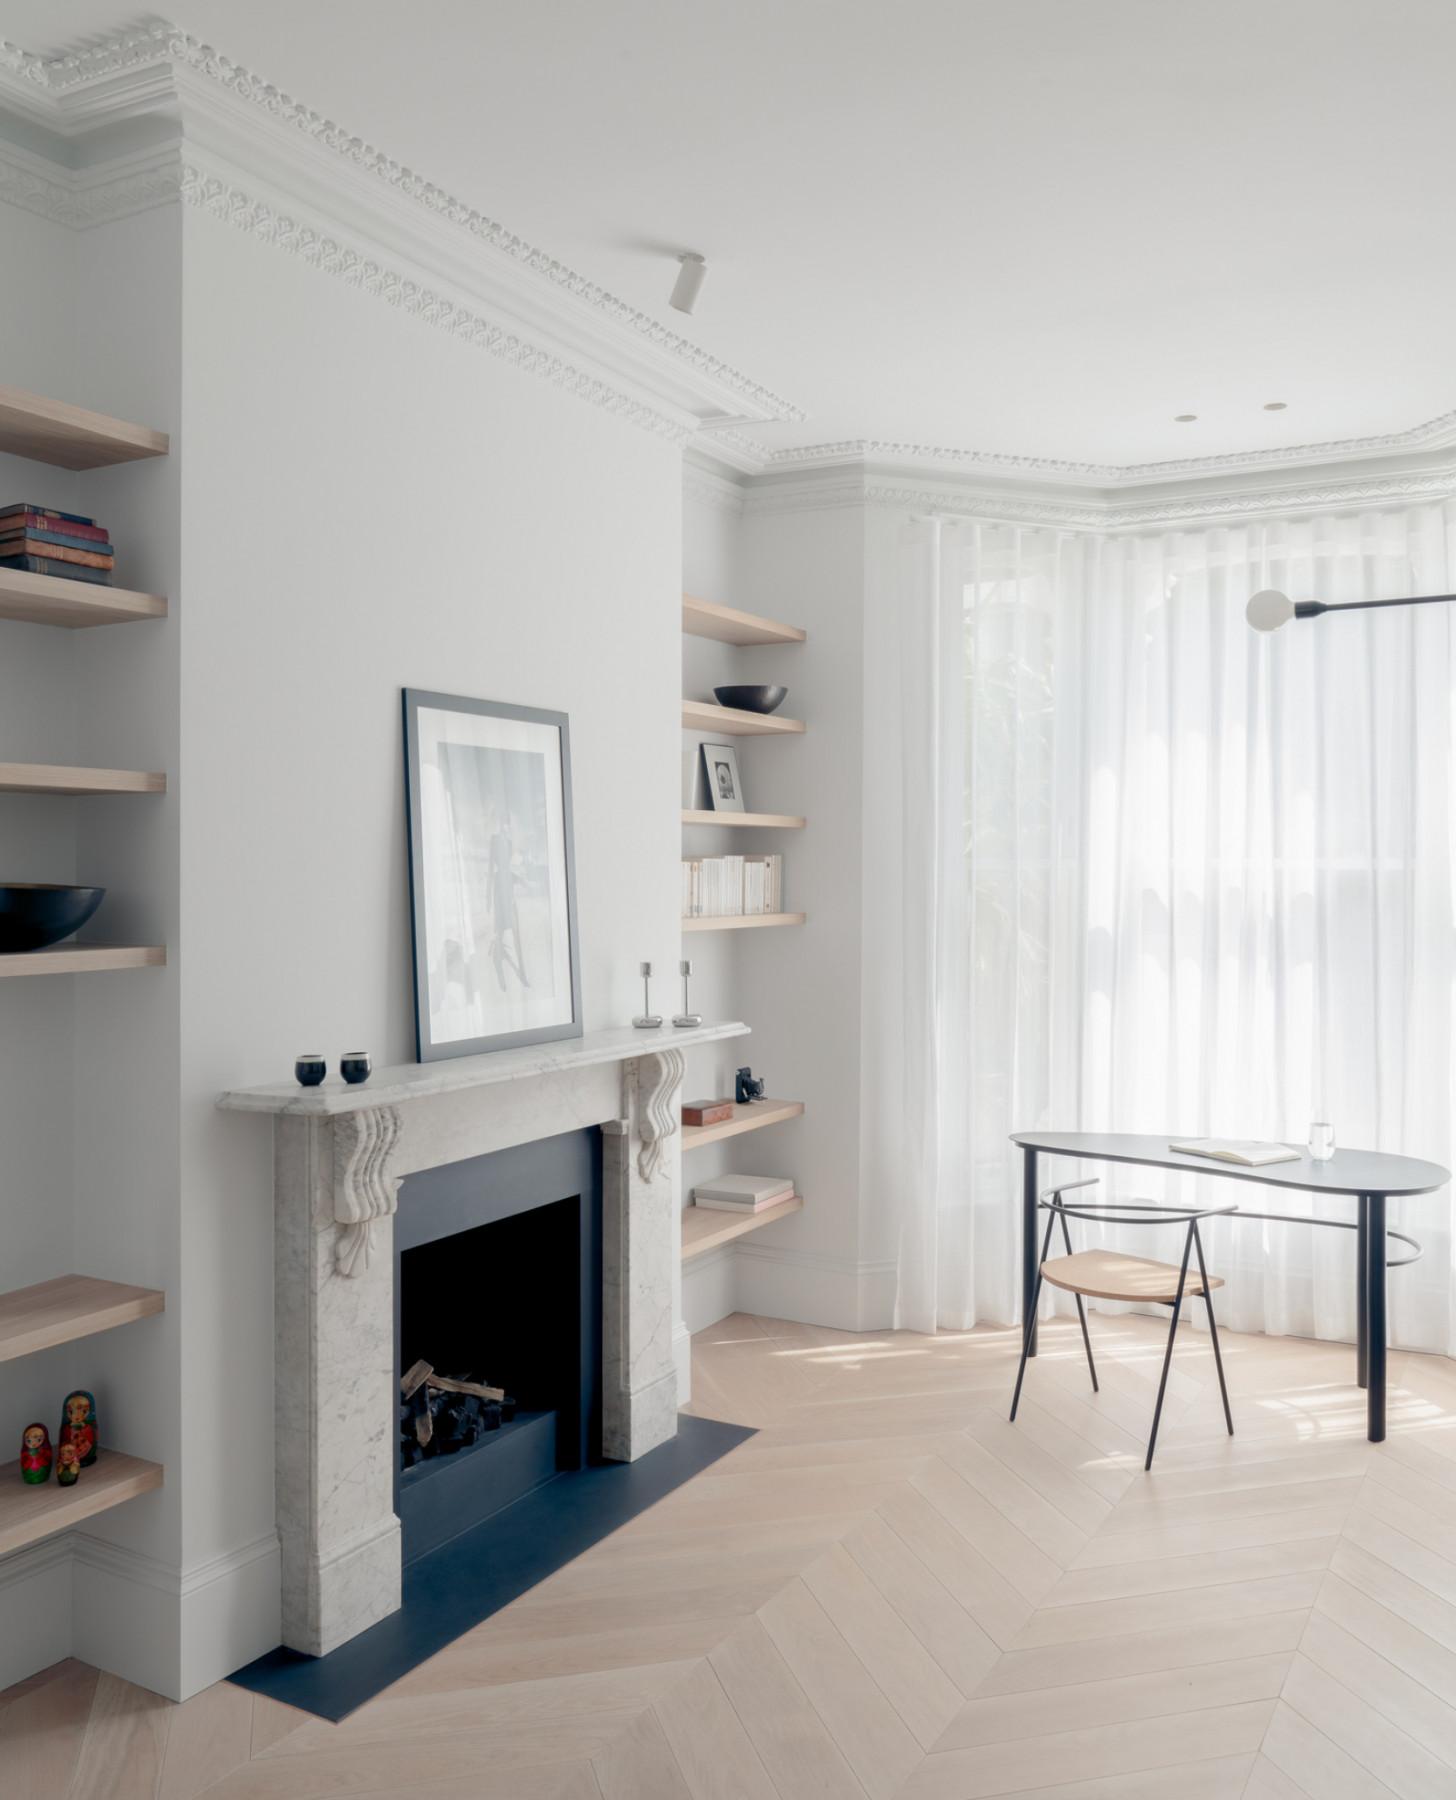 Oliver Leech Architects